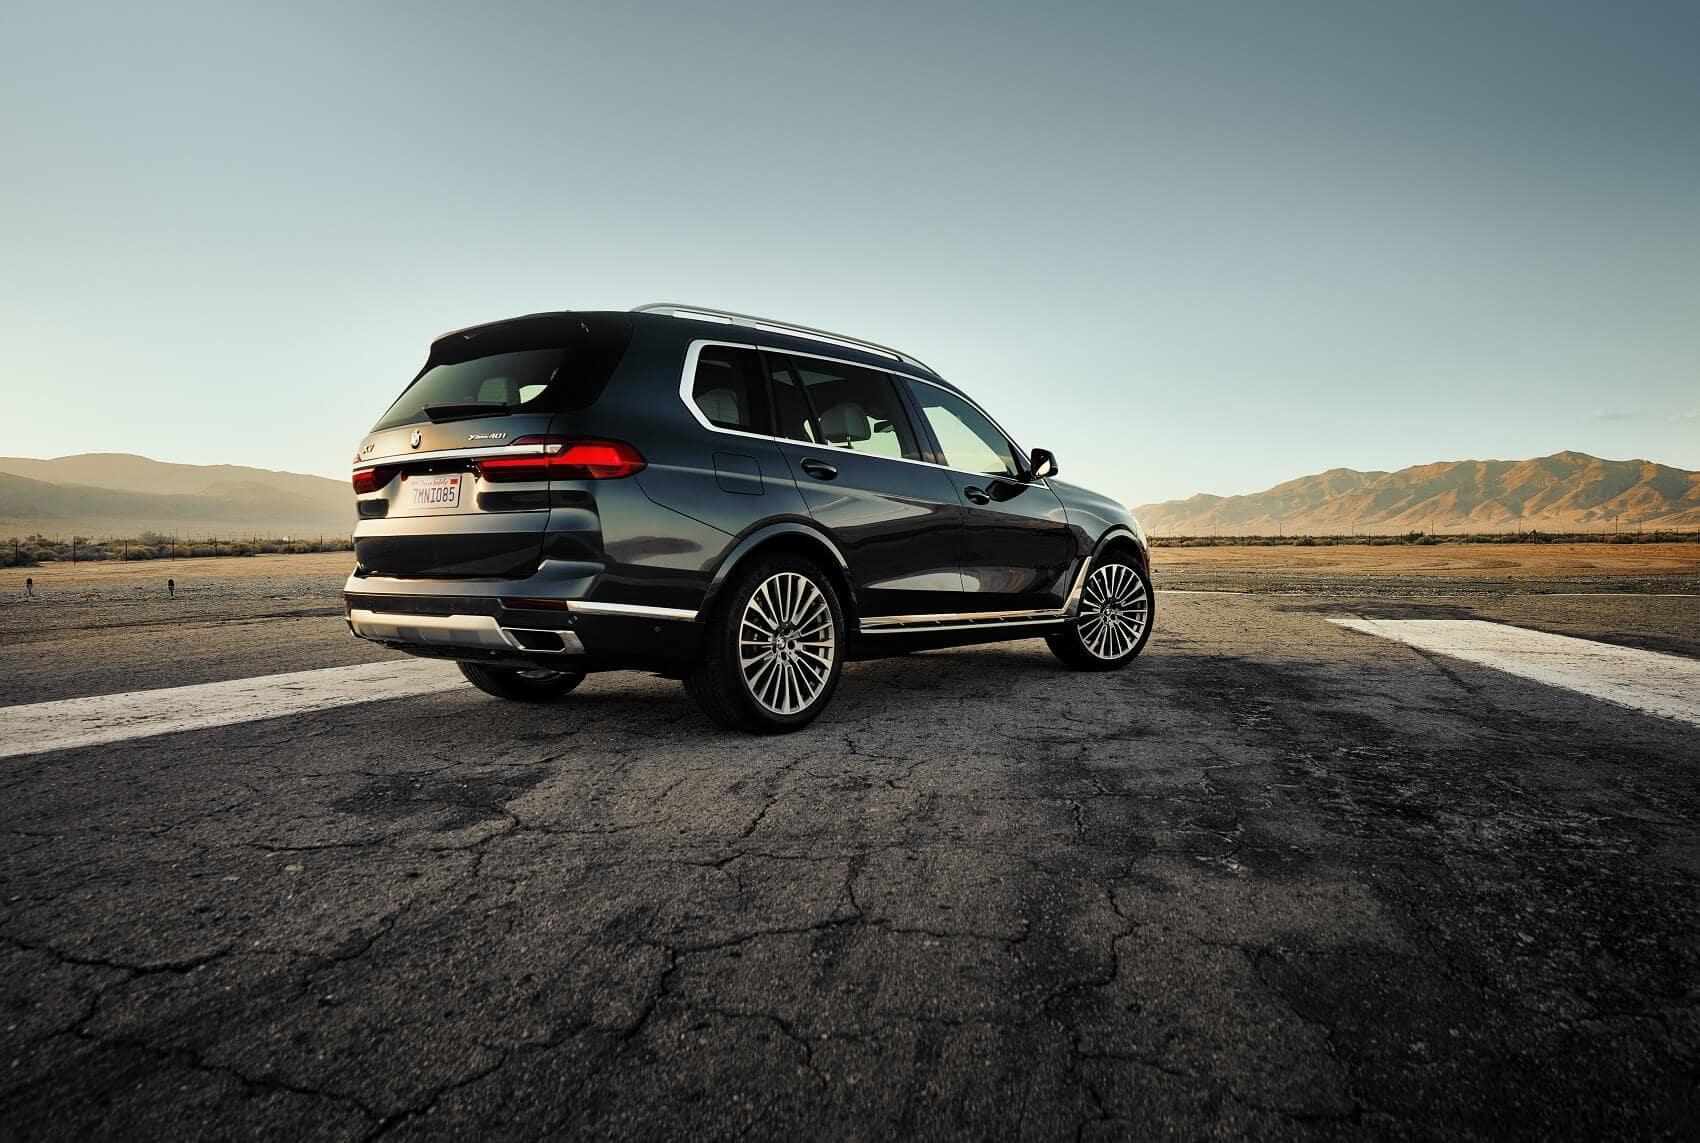 Black BMW X7 Exterior